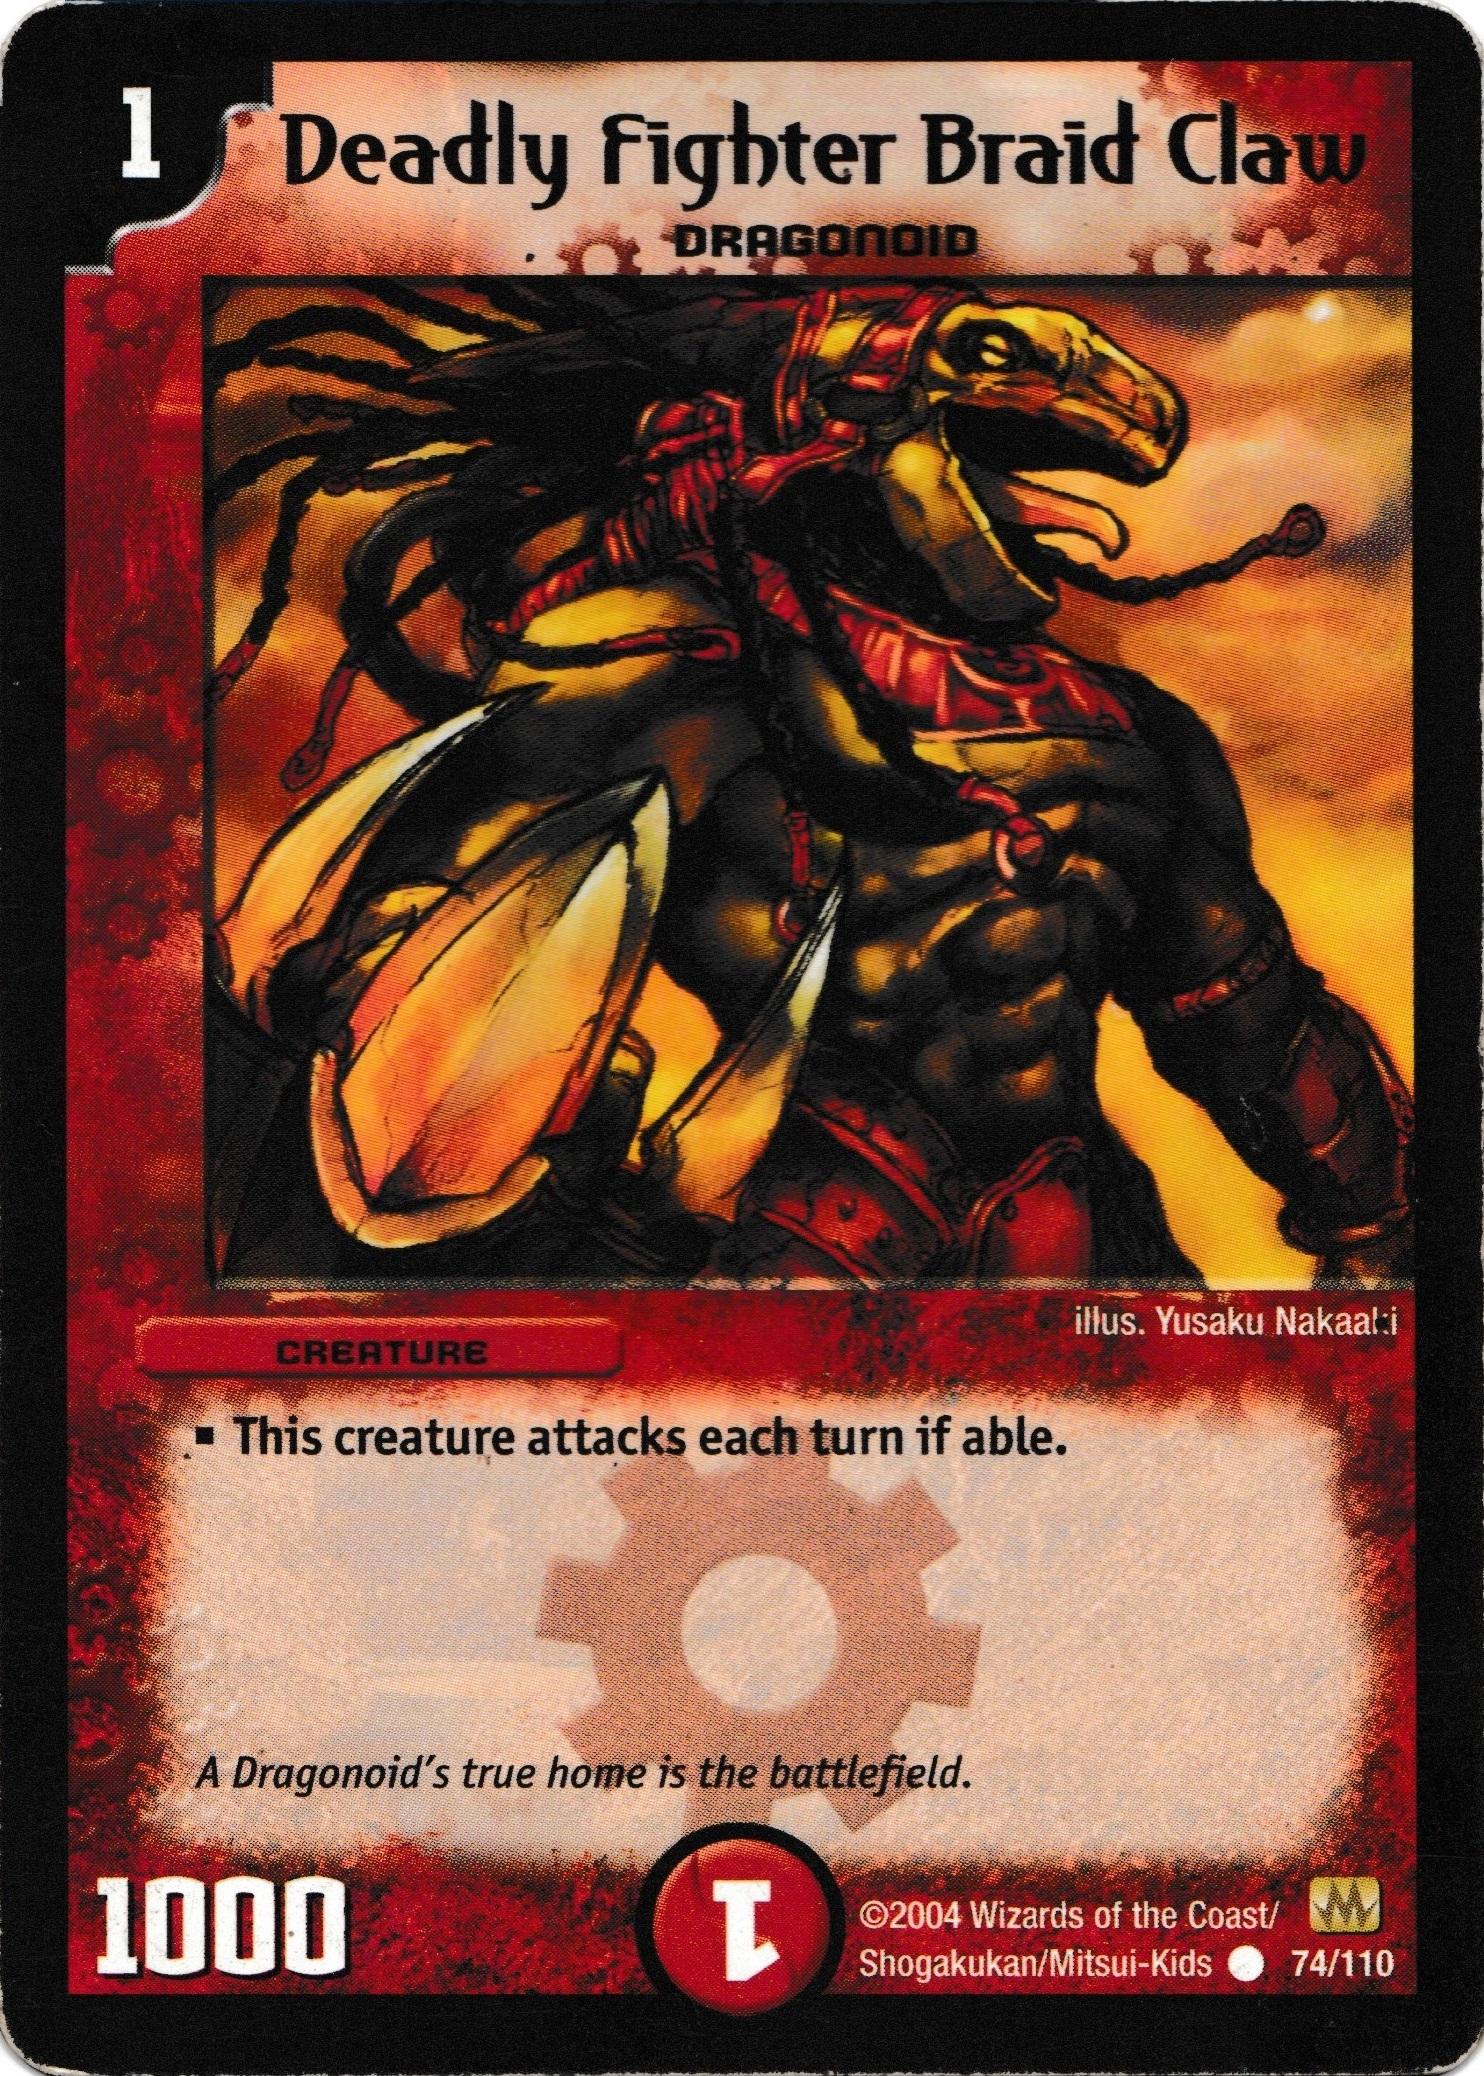 DM-01 Base Set - Käyttökelpoisimmat kortit DeadlyFighterBraidClaw